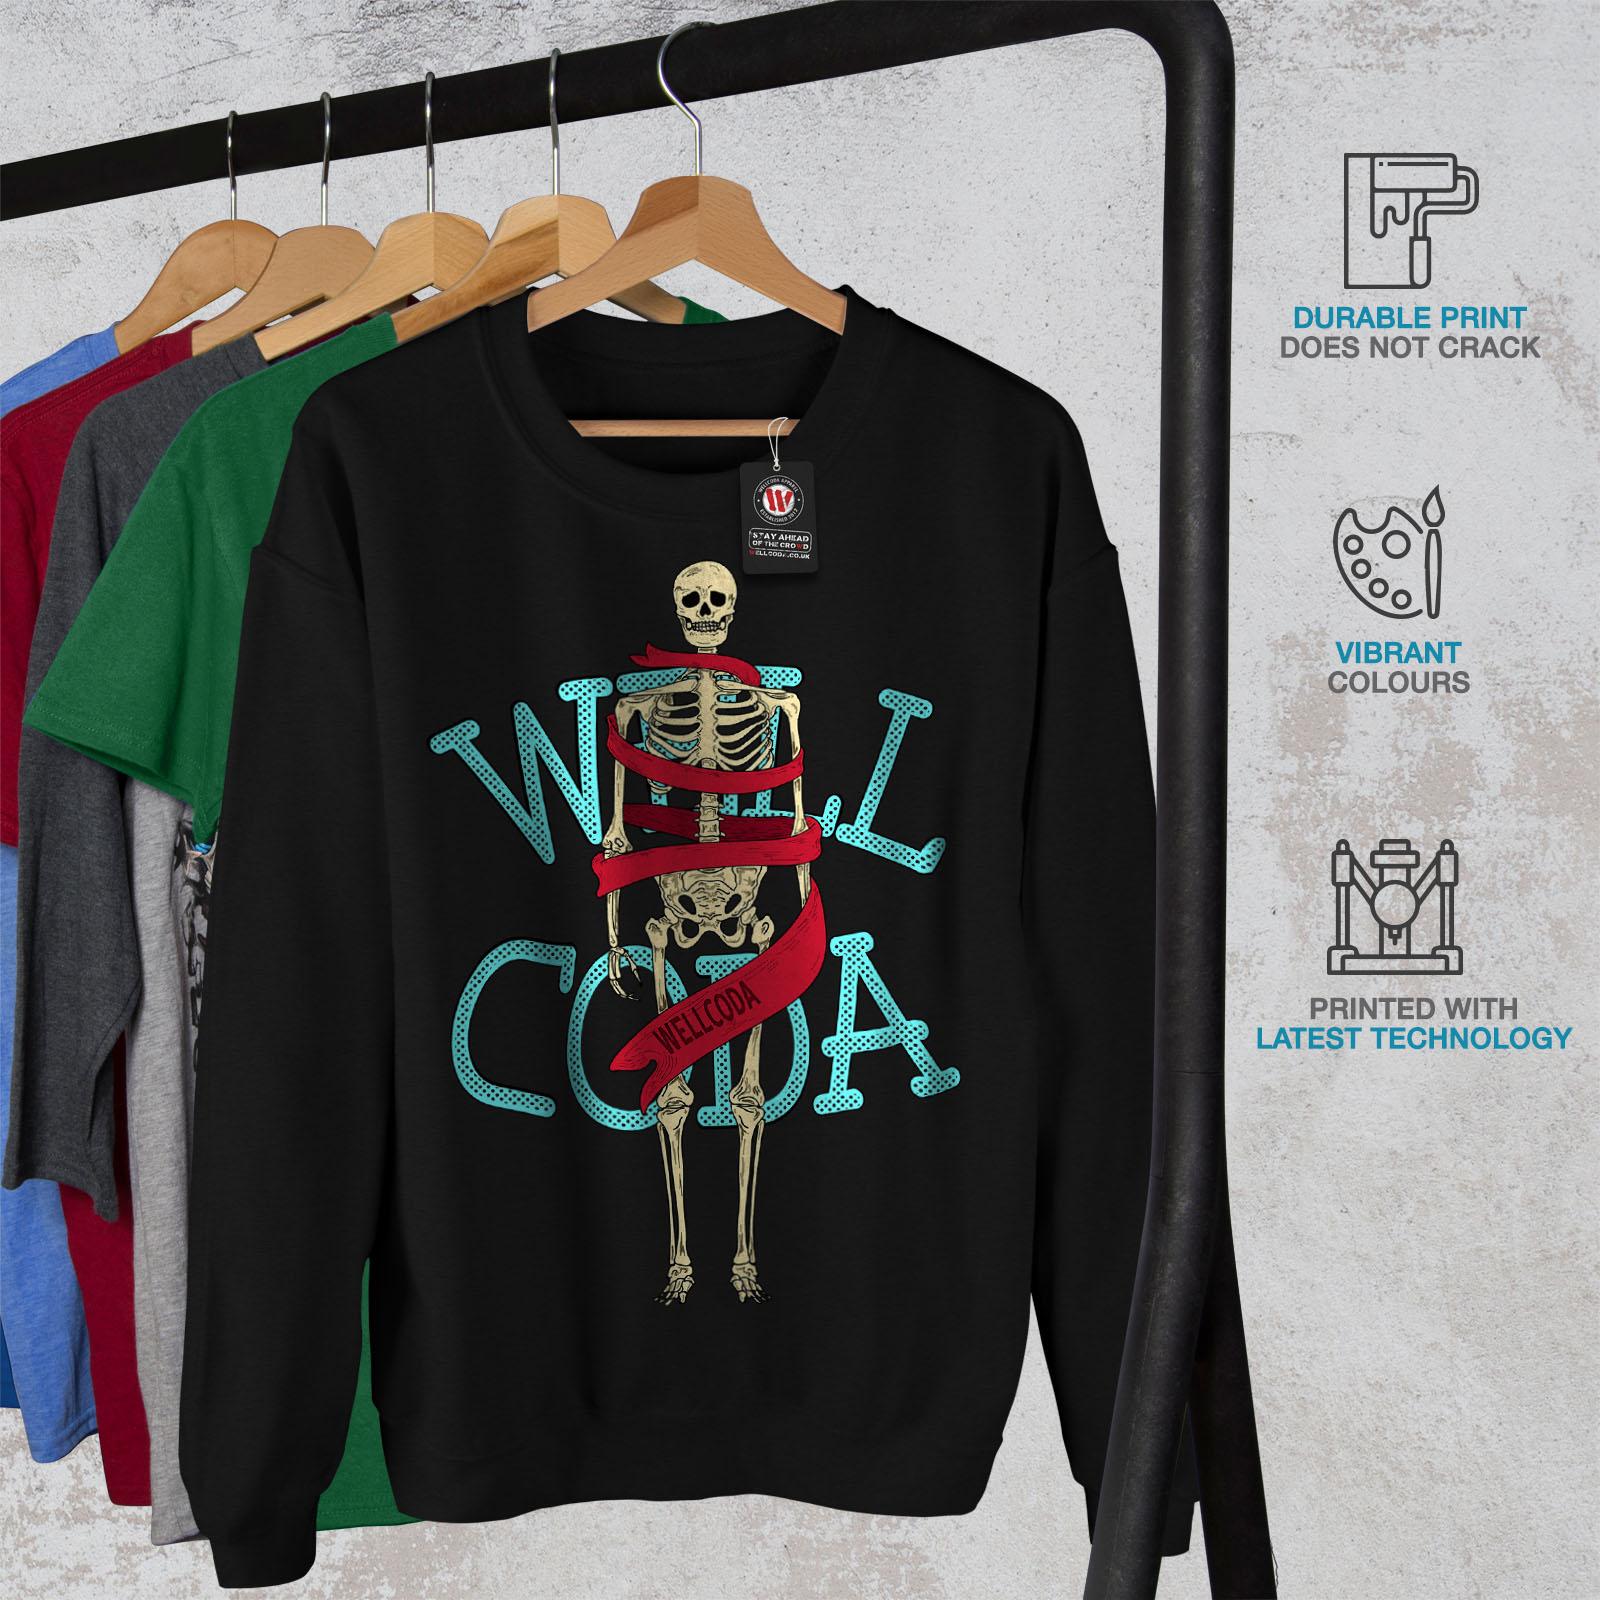 Wellcoda Mens Sweatshirt Anatomy Skeleton Black Pullover Fashion Casual Jumper EwxEr7qRB